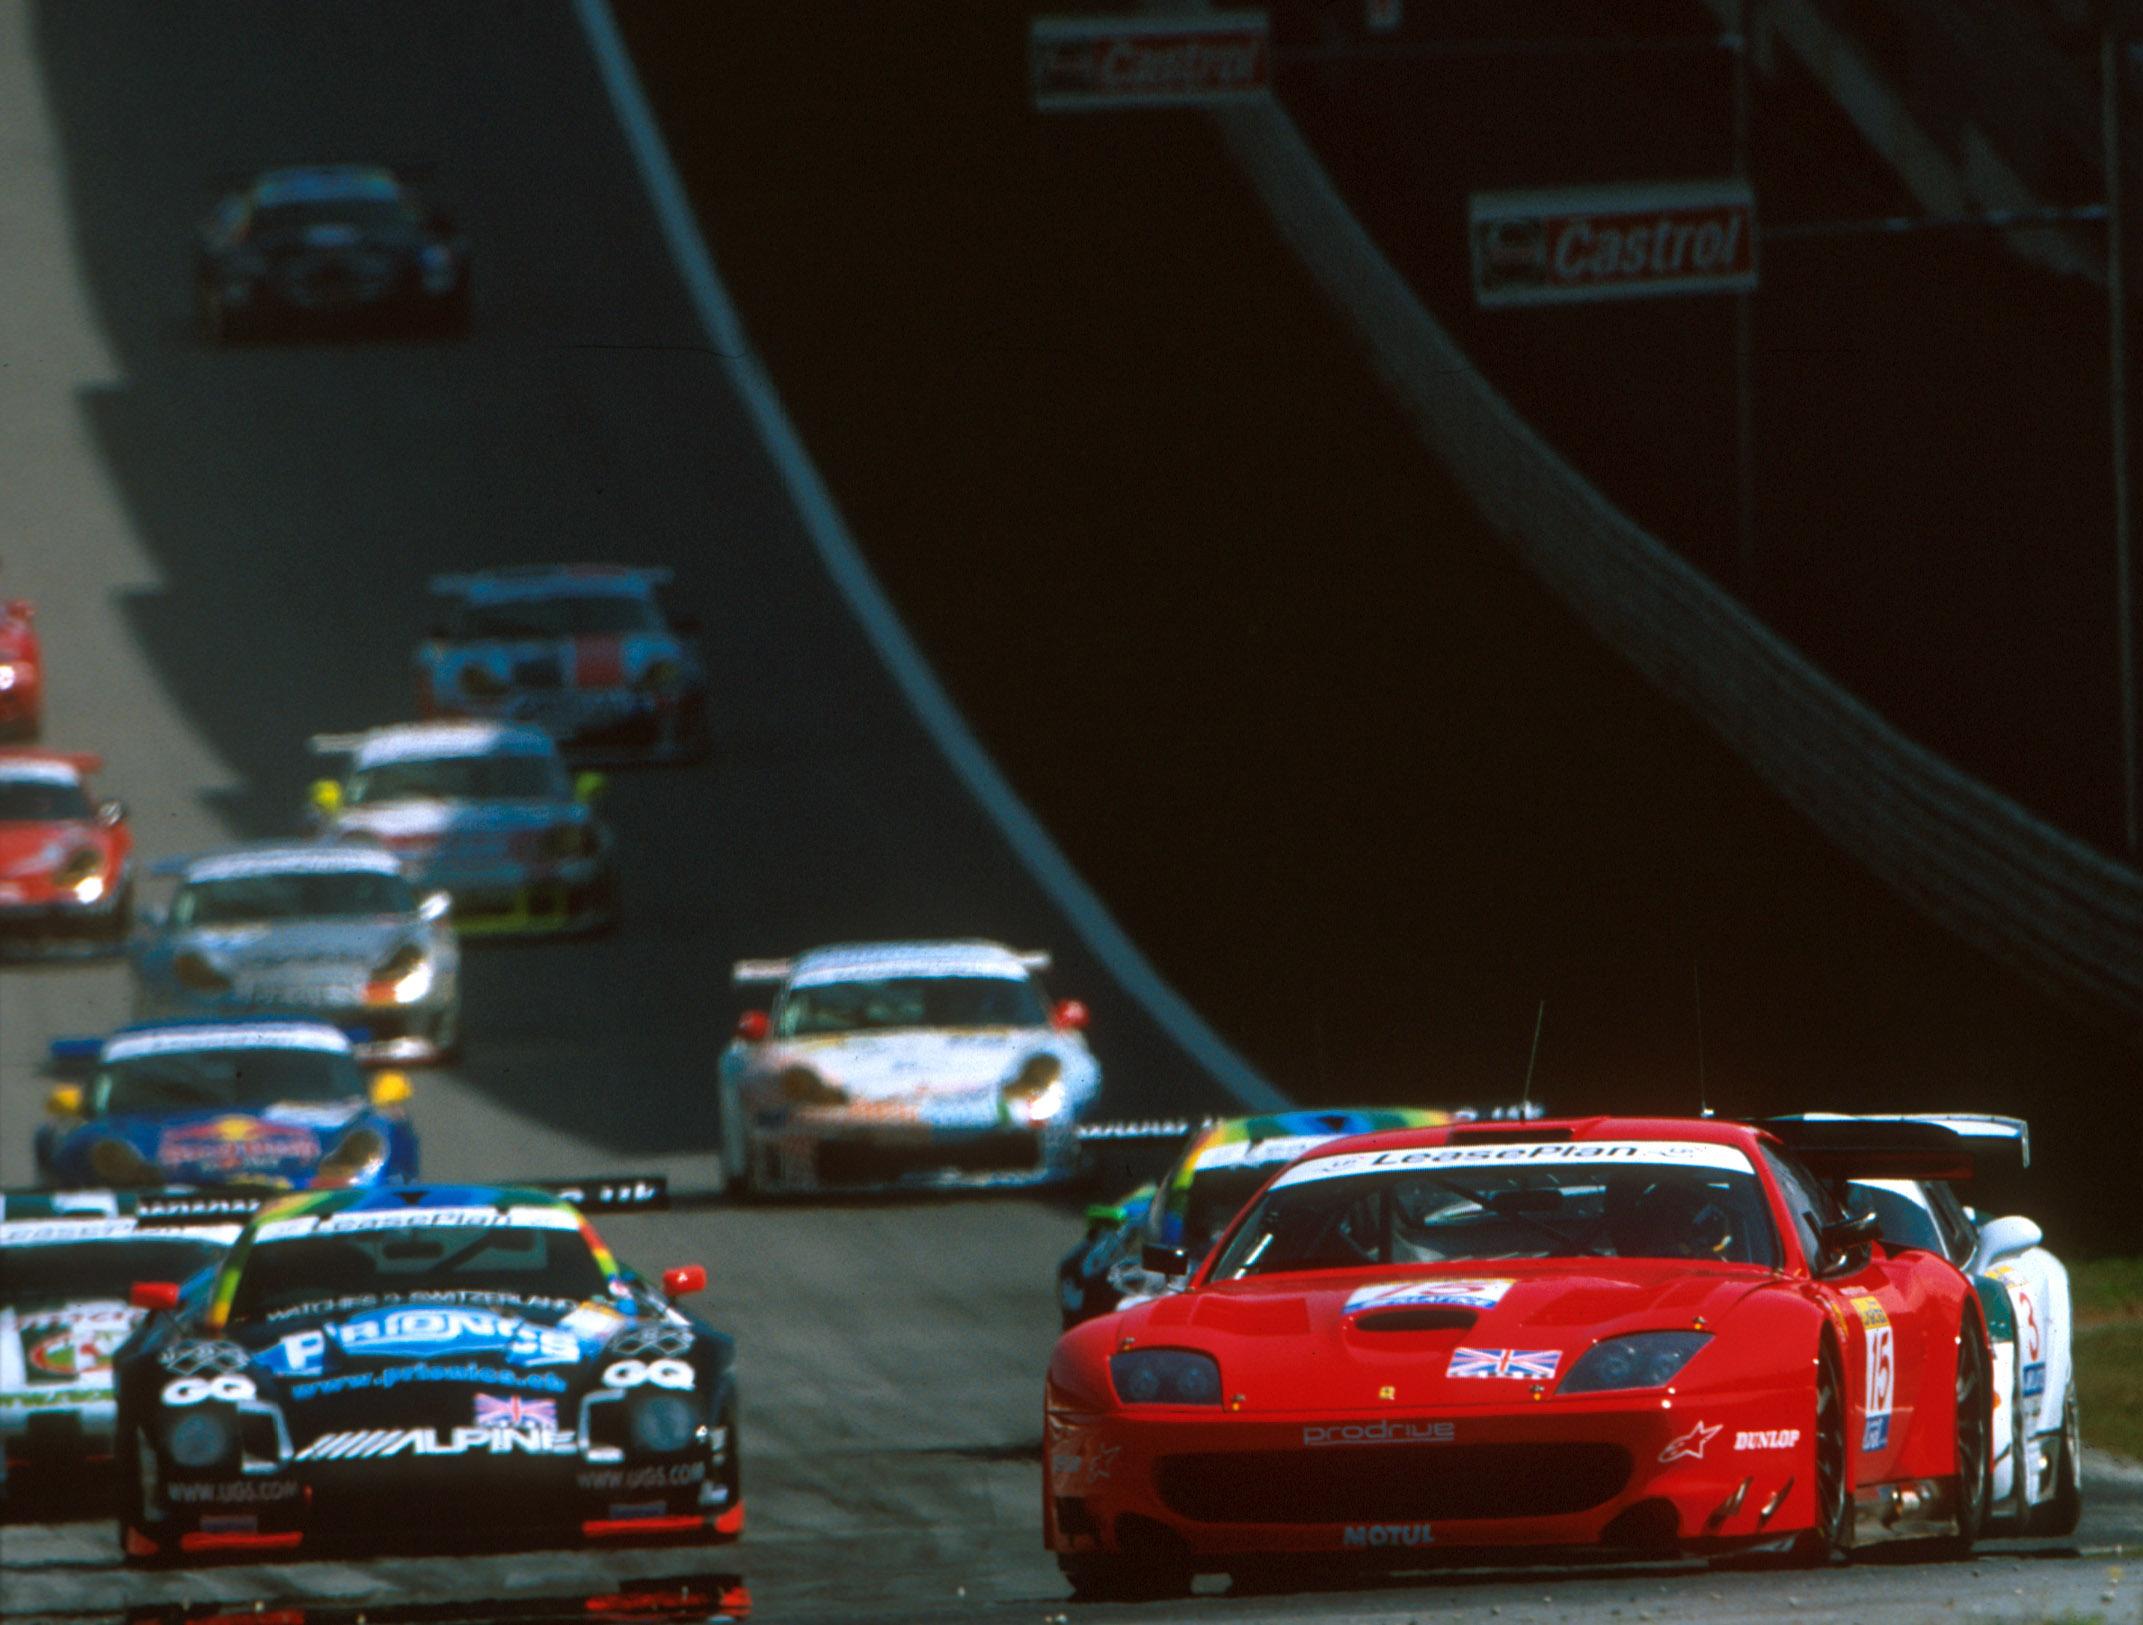 Ferrari A1-ring lead